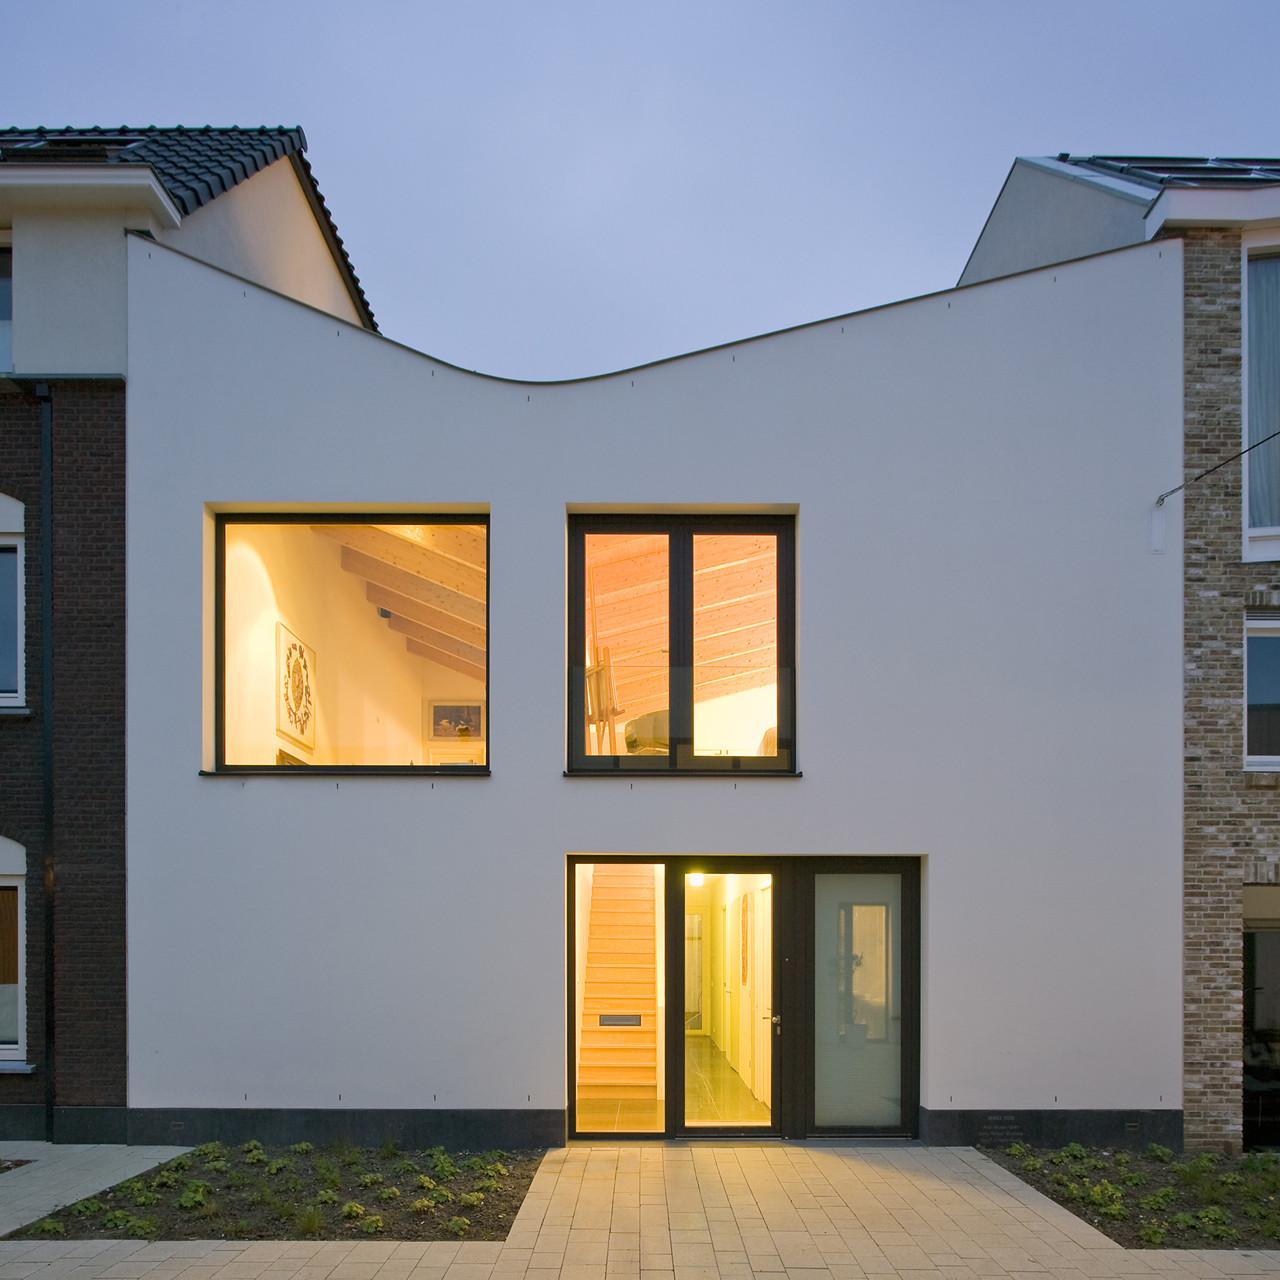 V-House / GAAGA, © Marcel van der Burg